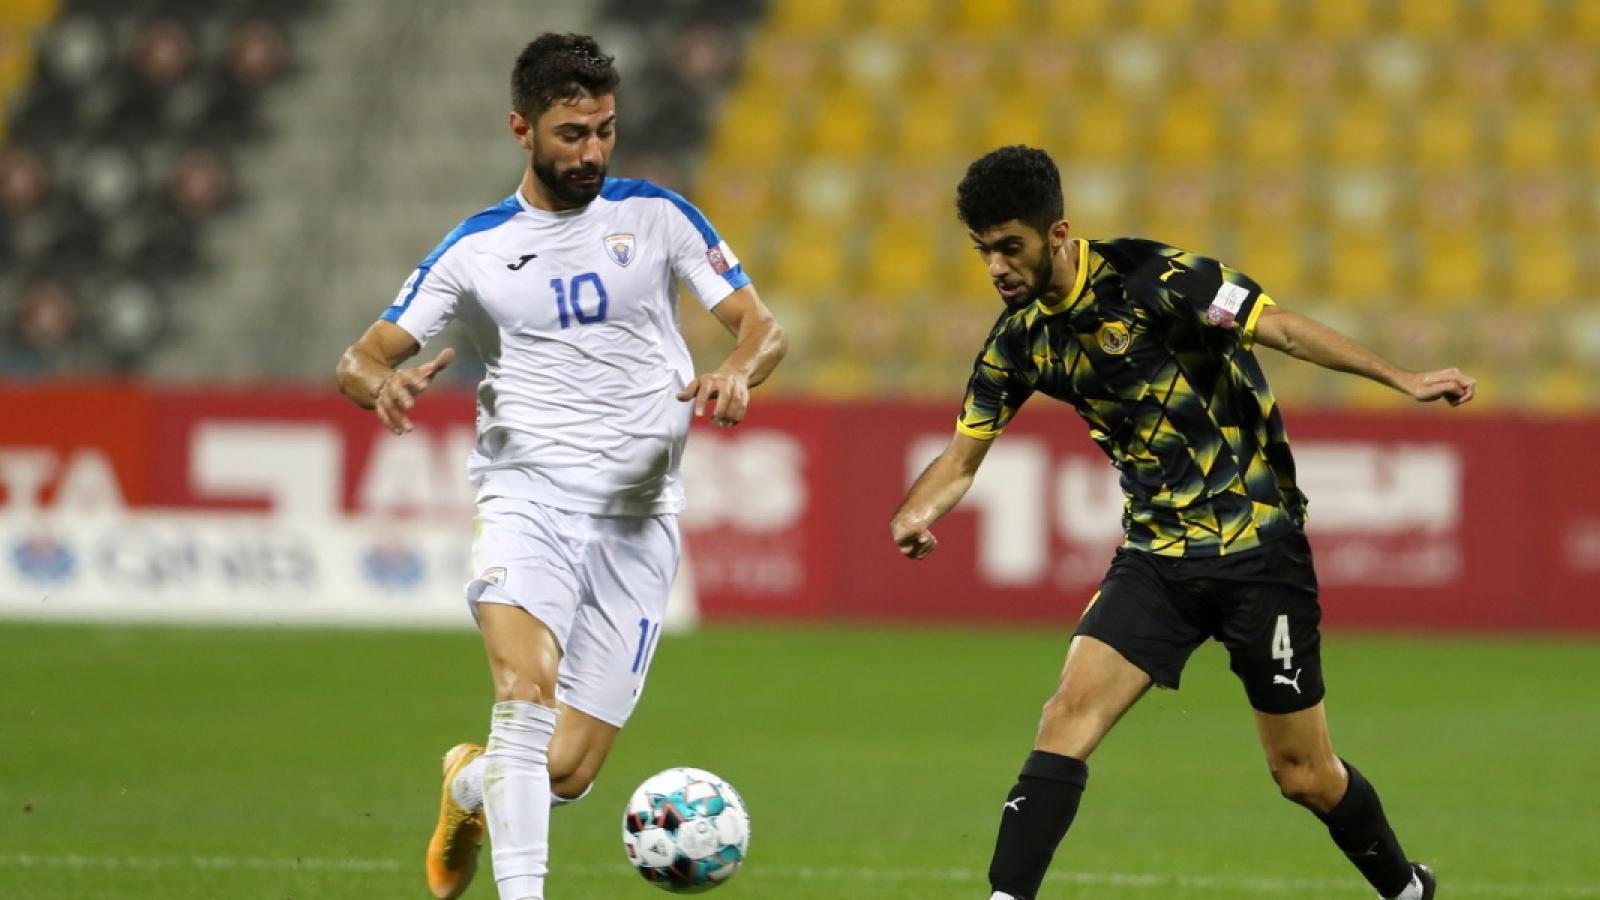 WATCH: QNB Stars League - Week 13 highlights